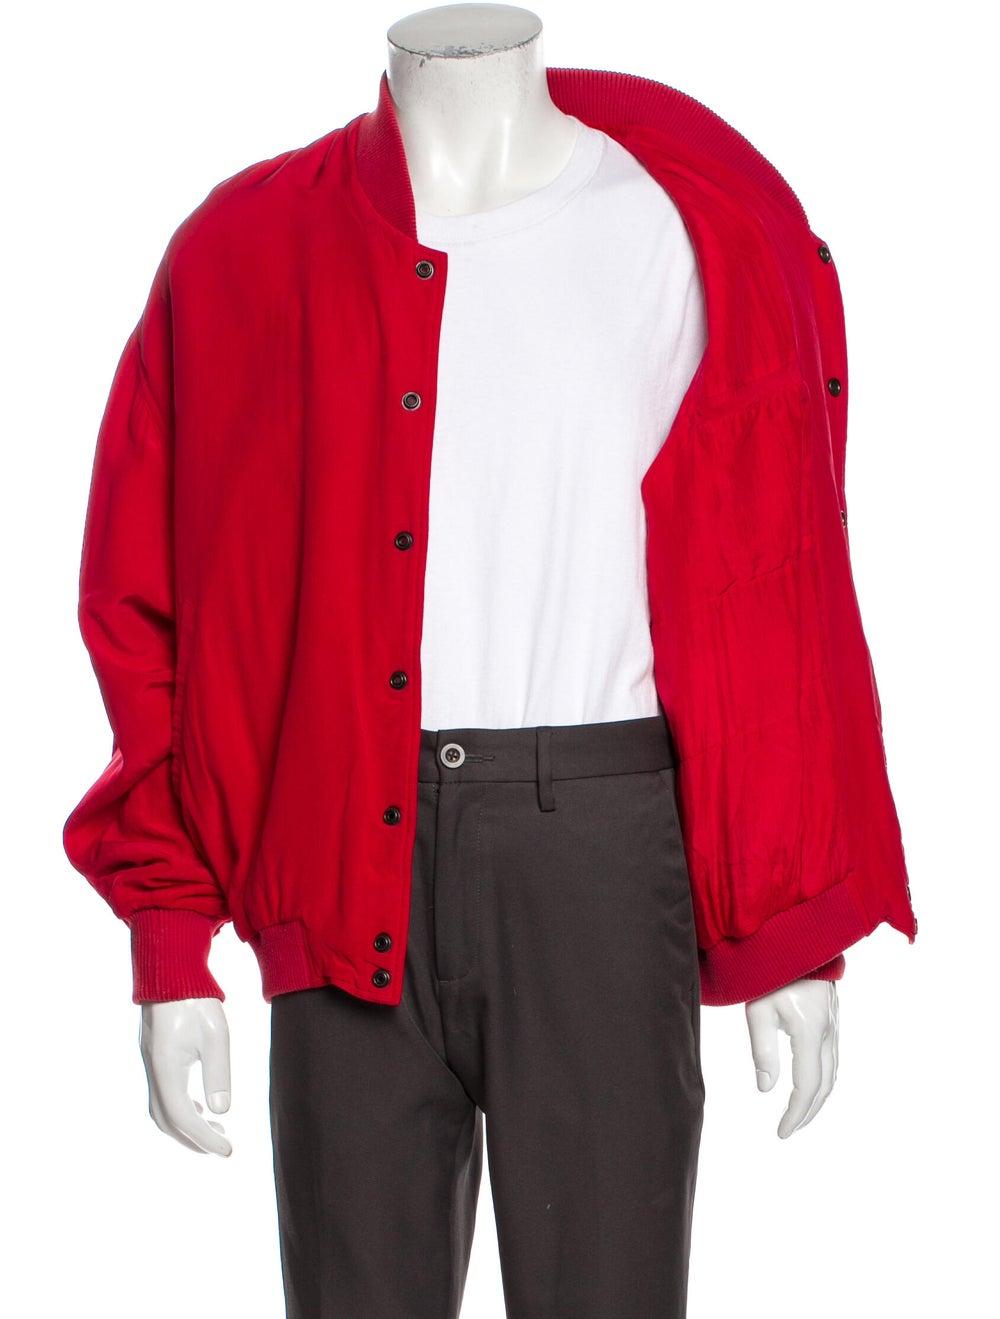 Go Silk Silk Bomber Jacket Red - image 4